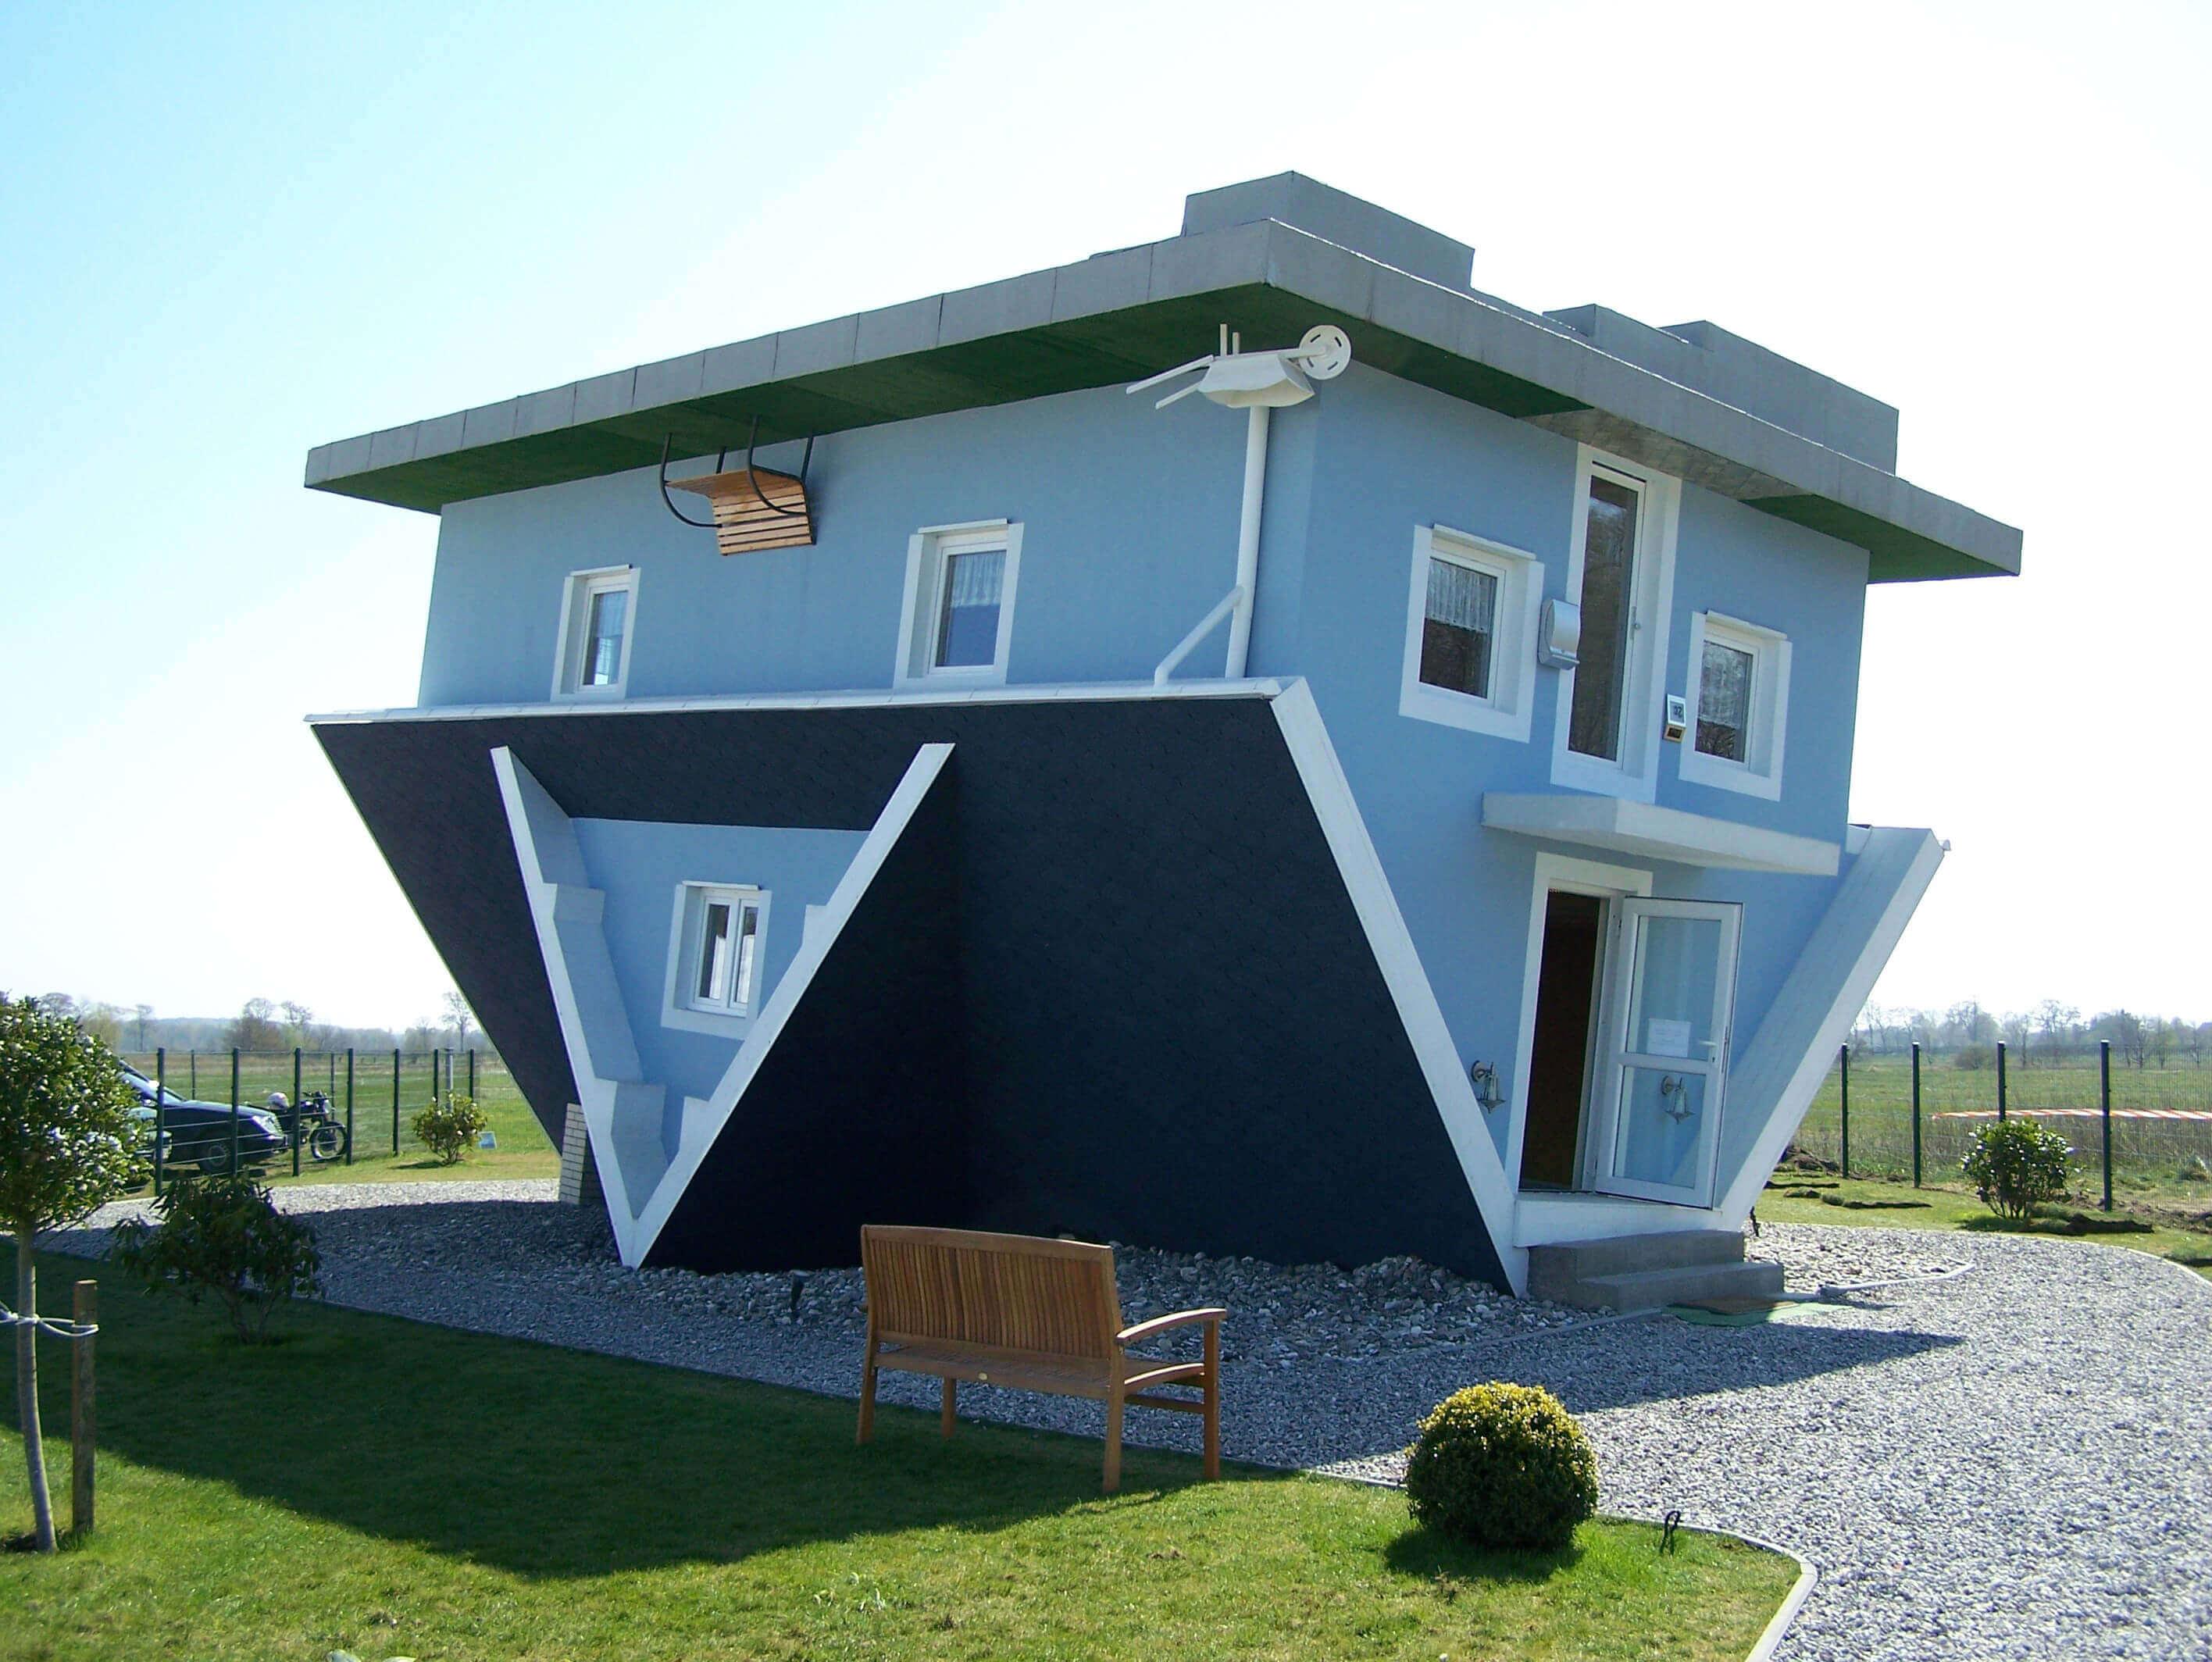 Home Renovation: Avoid Ending Up All Upside Down